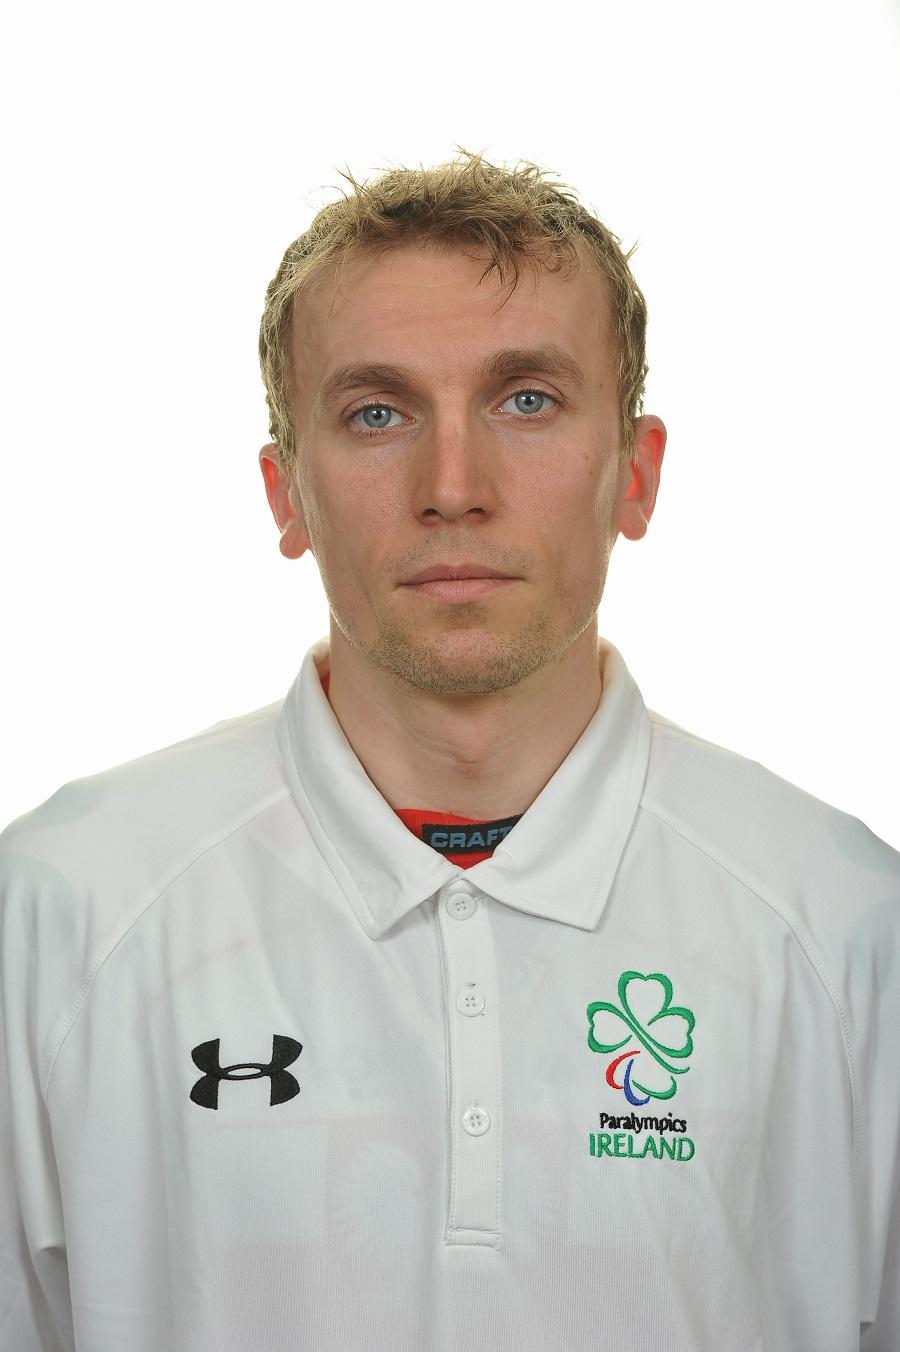 Peter Ryan